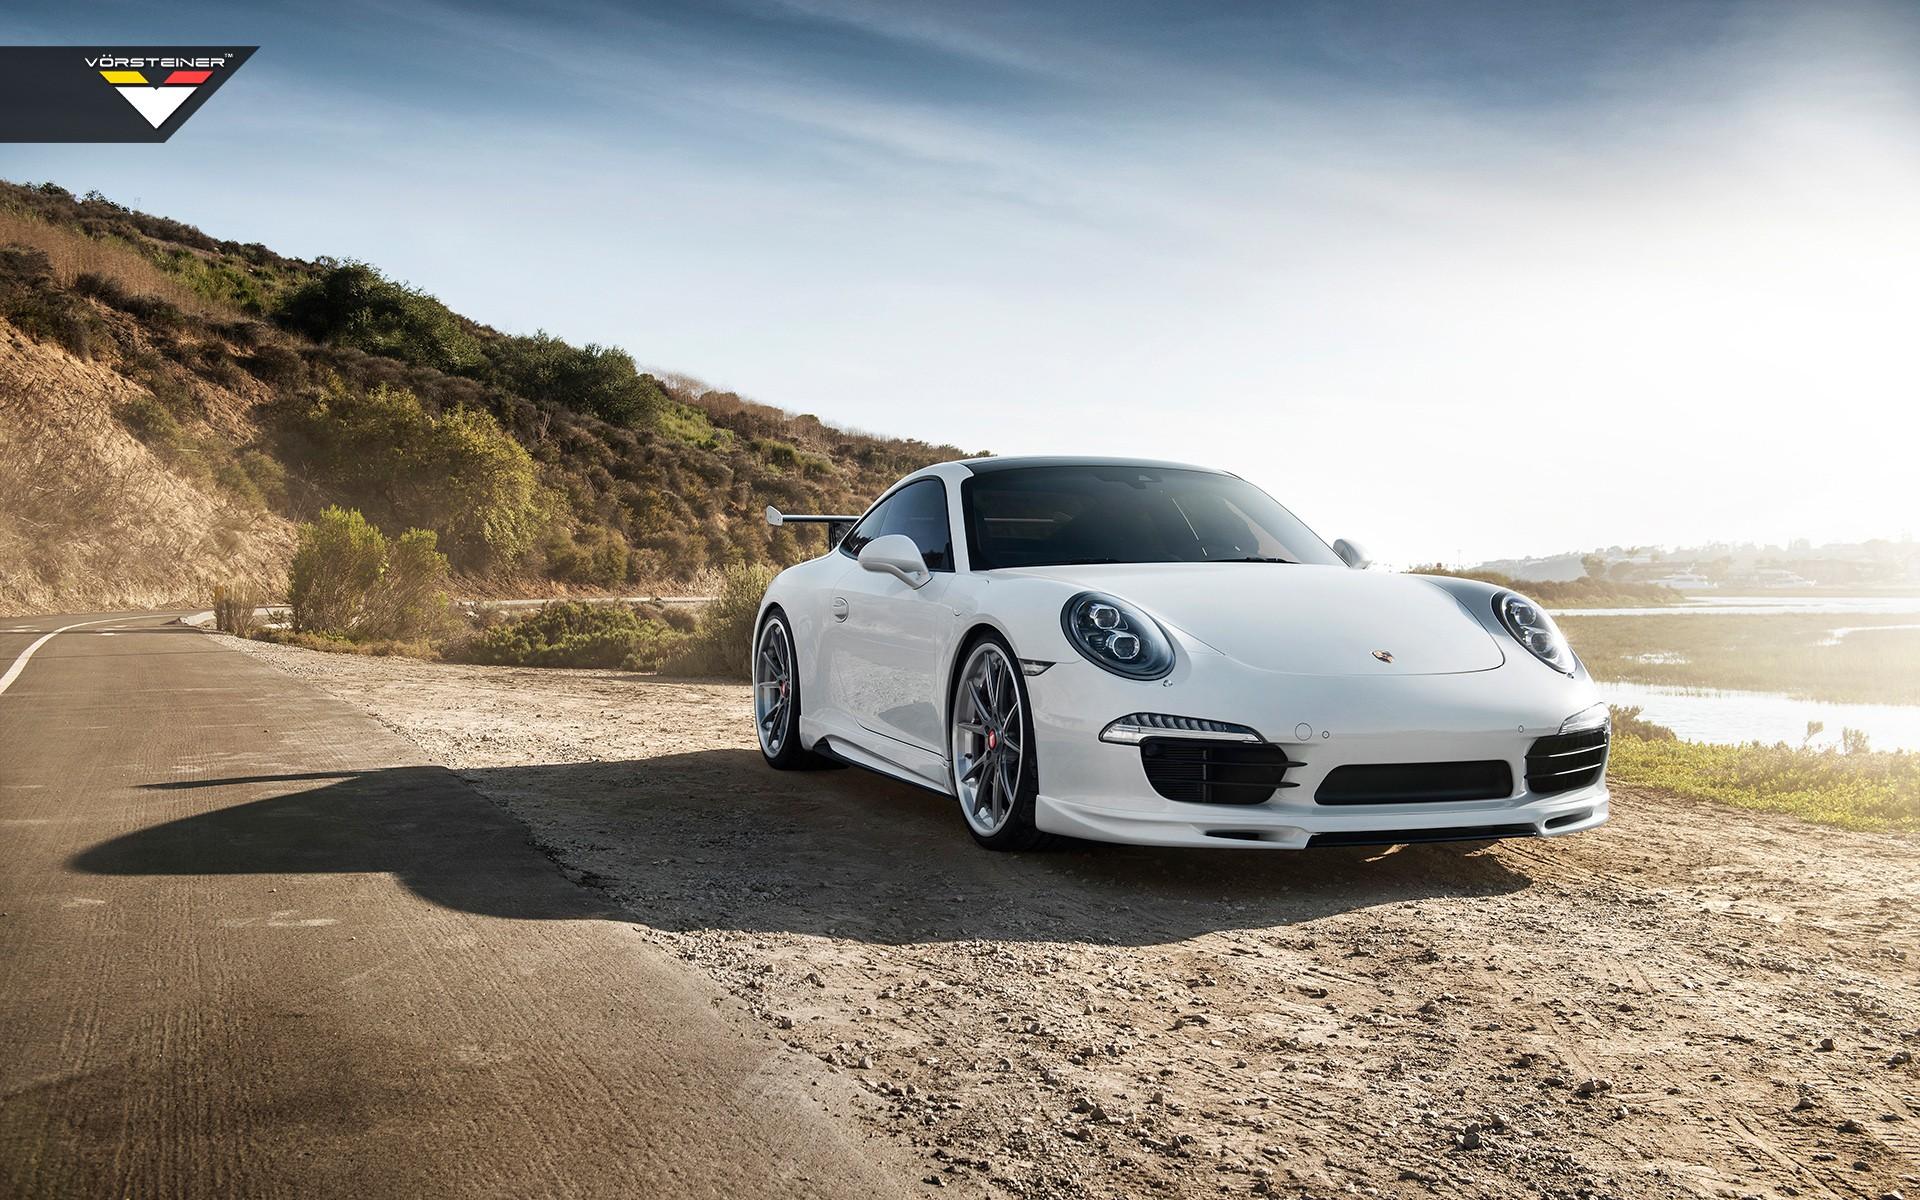 2016 Porsche 991 Carrera S Vorsteiner V Gt Aero Program Wallpapers